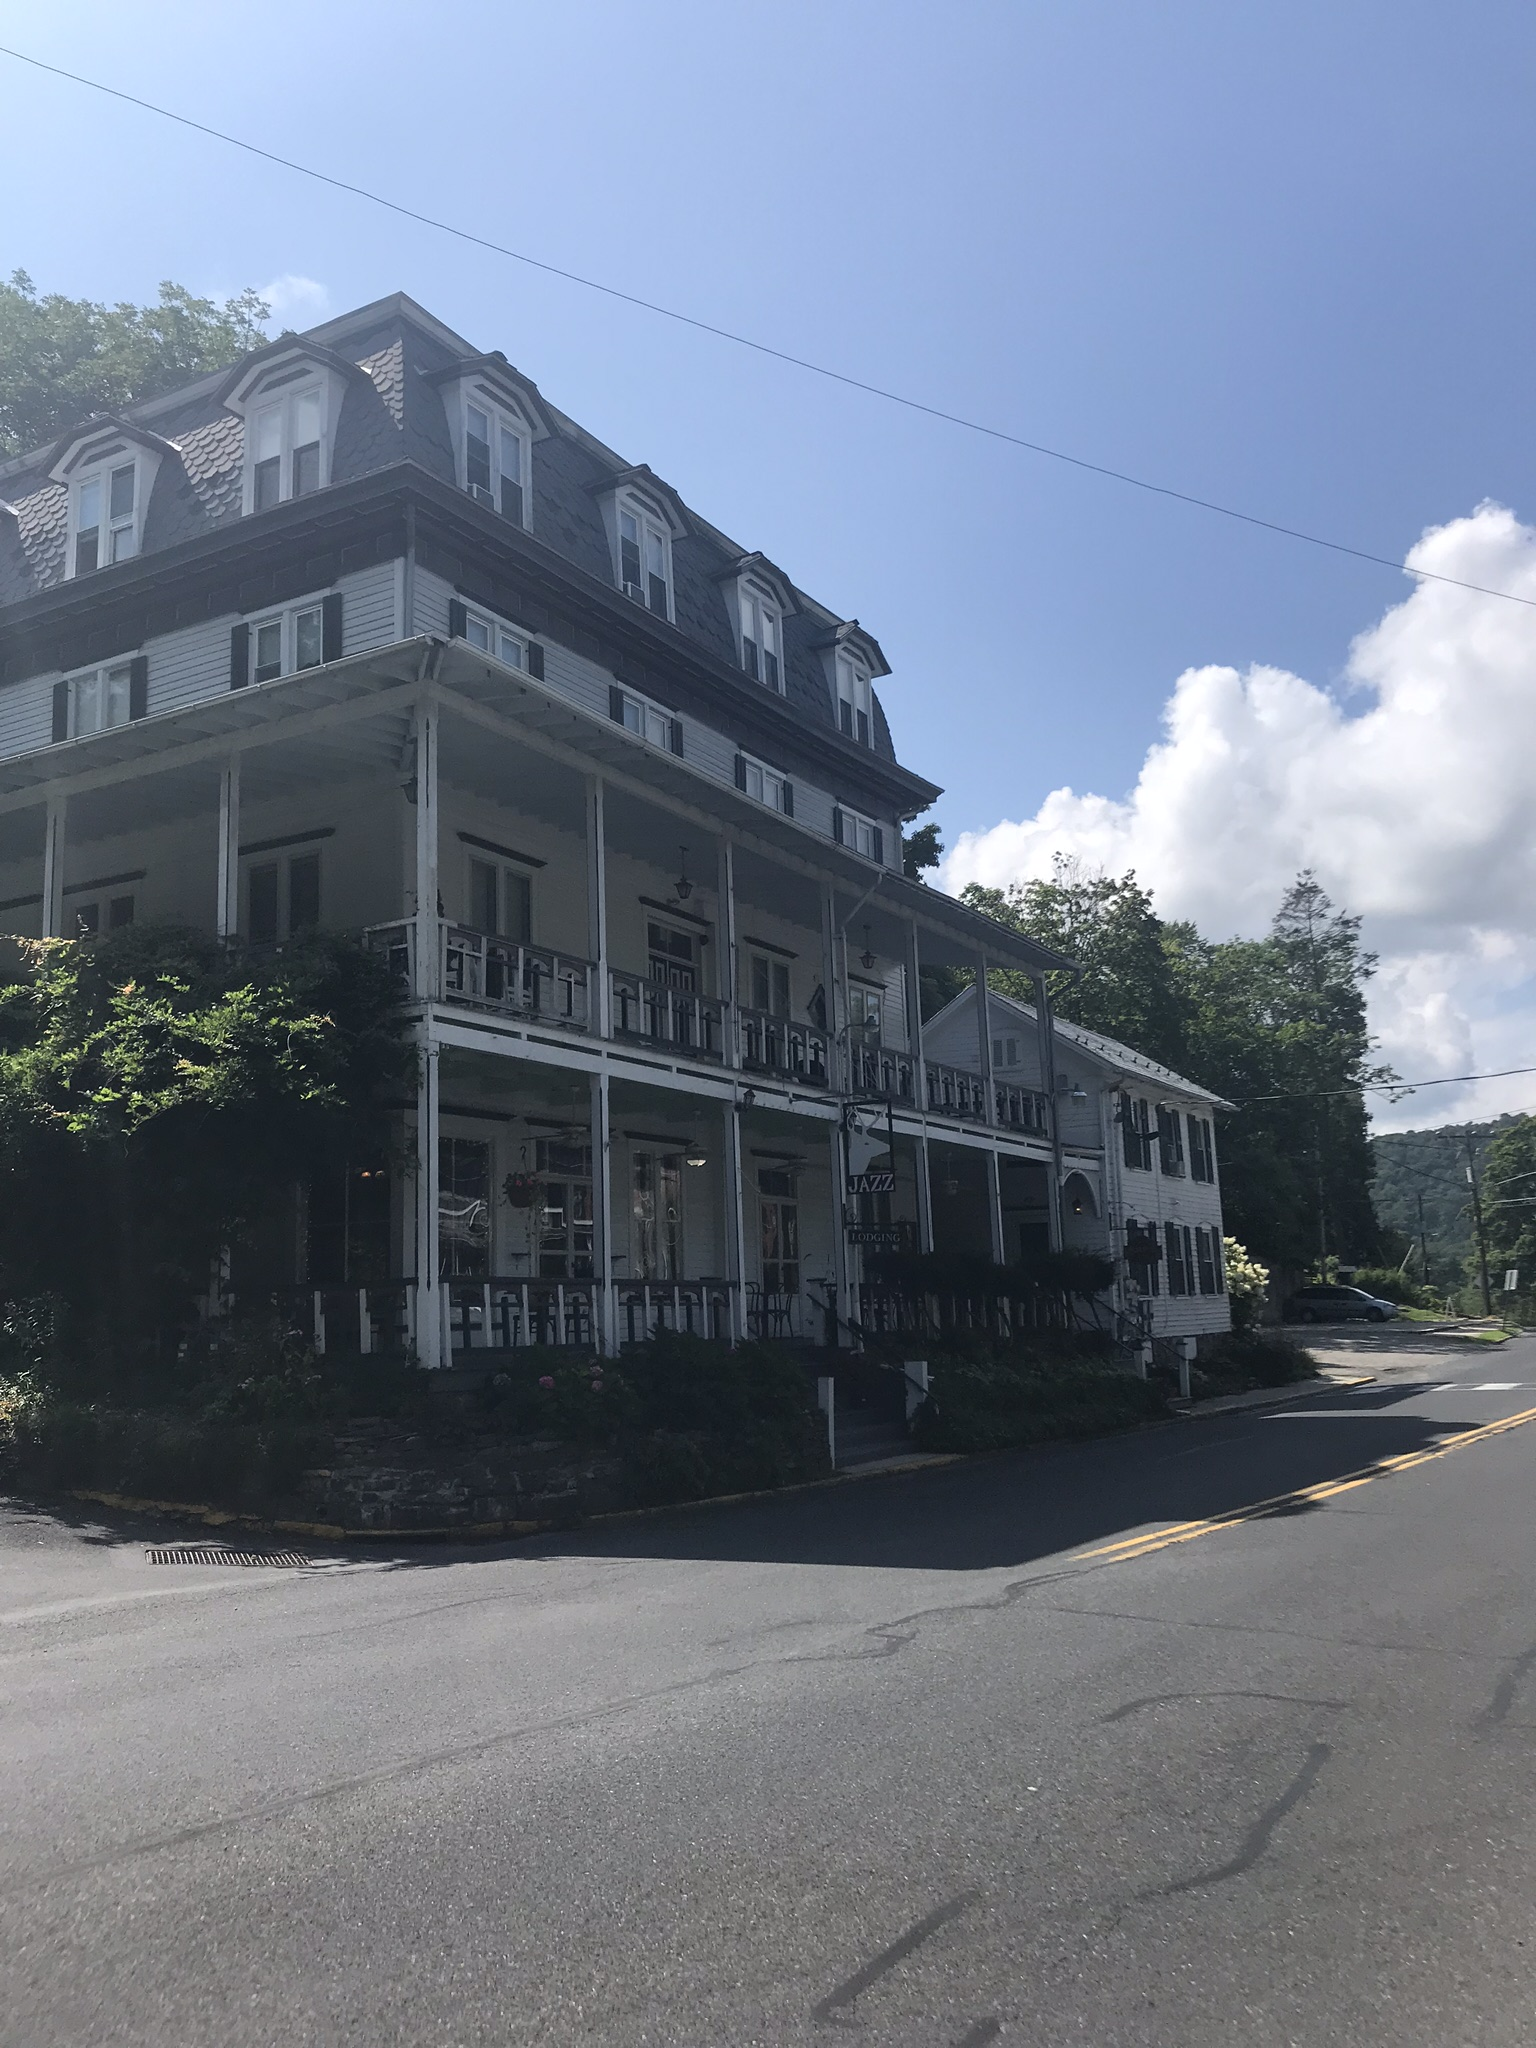 The Deerhead Inn. I spent a few nights in my youth here.